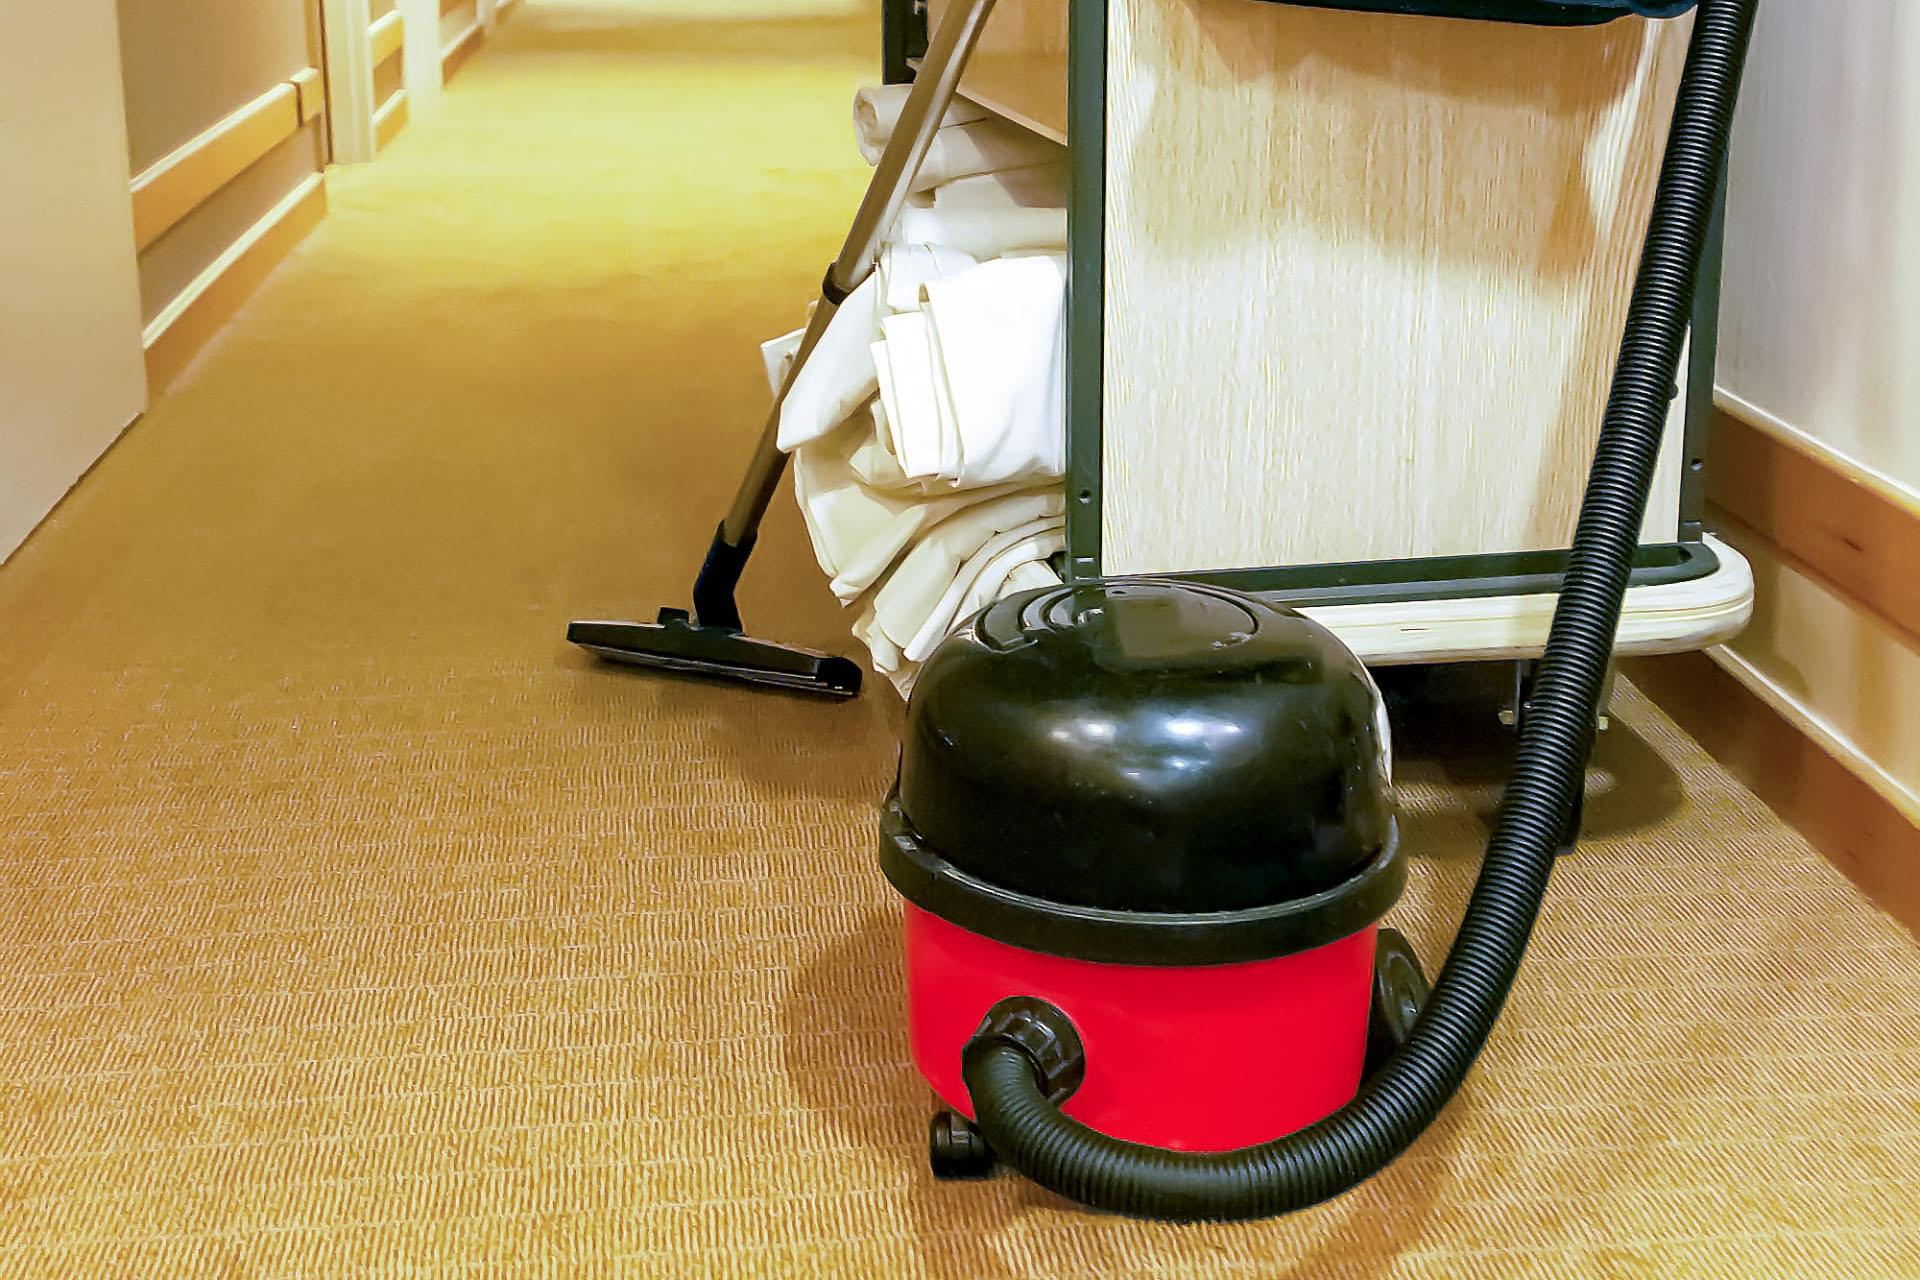 大阪 掃除機 清掃 の画像